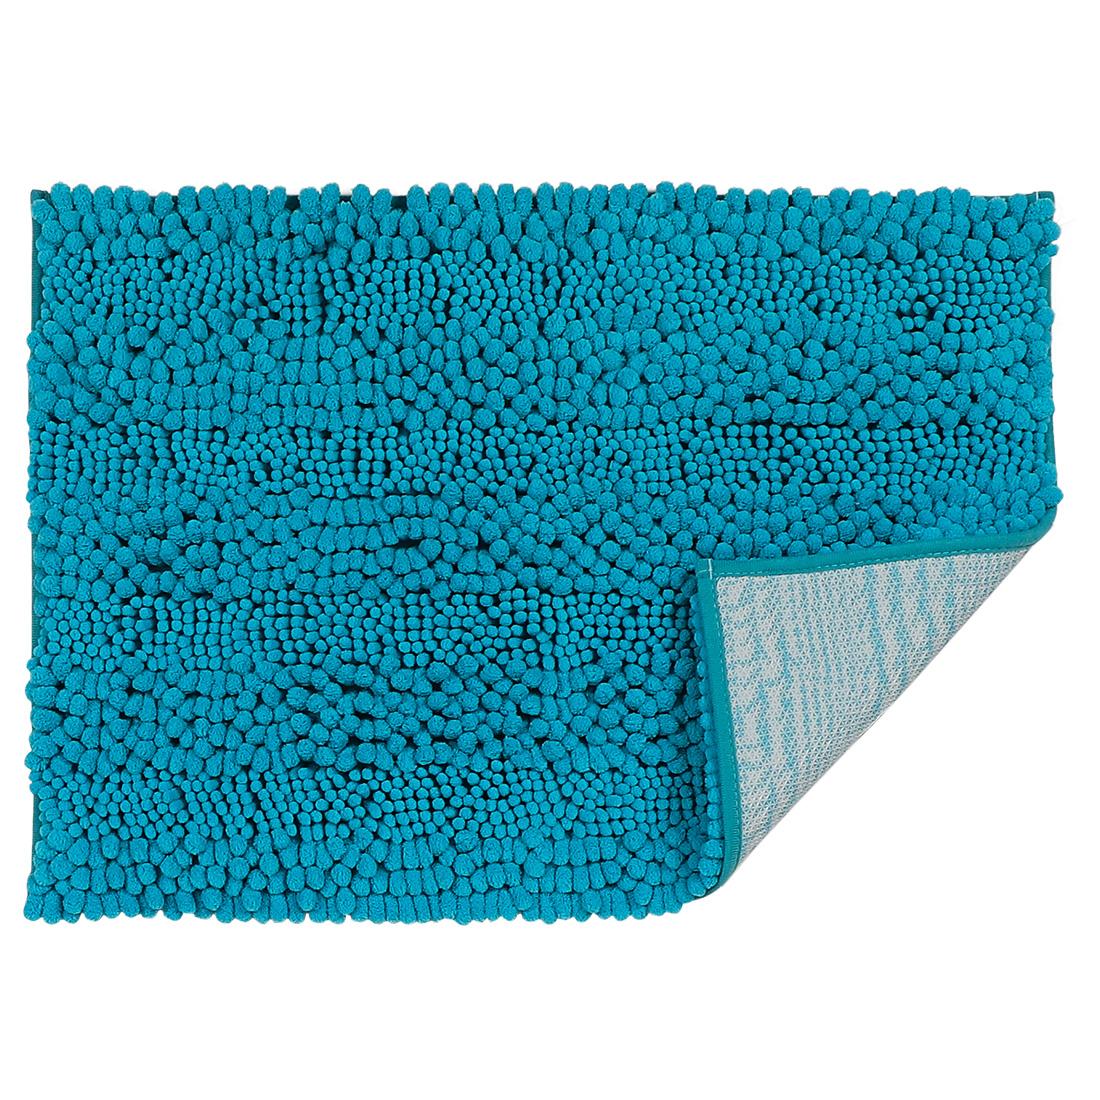 17 x 24 Inch Luxury Soft Plush Shaggy Bath Mat Chenille Rug Carpet Blue